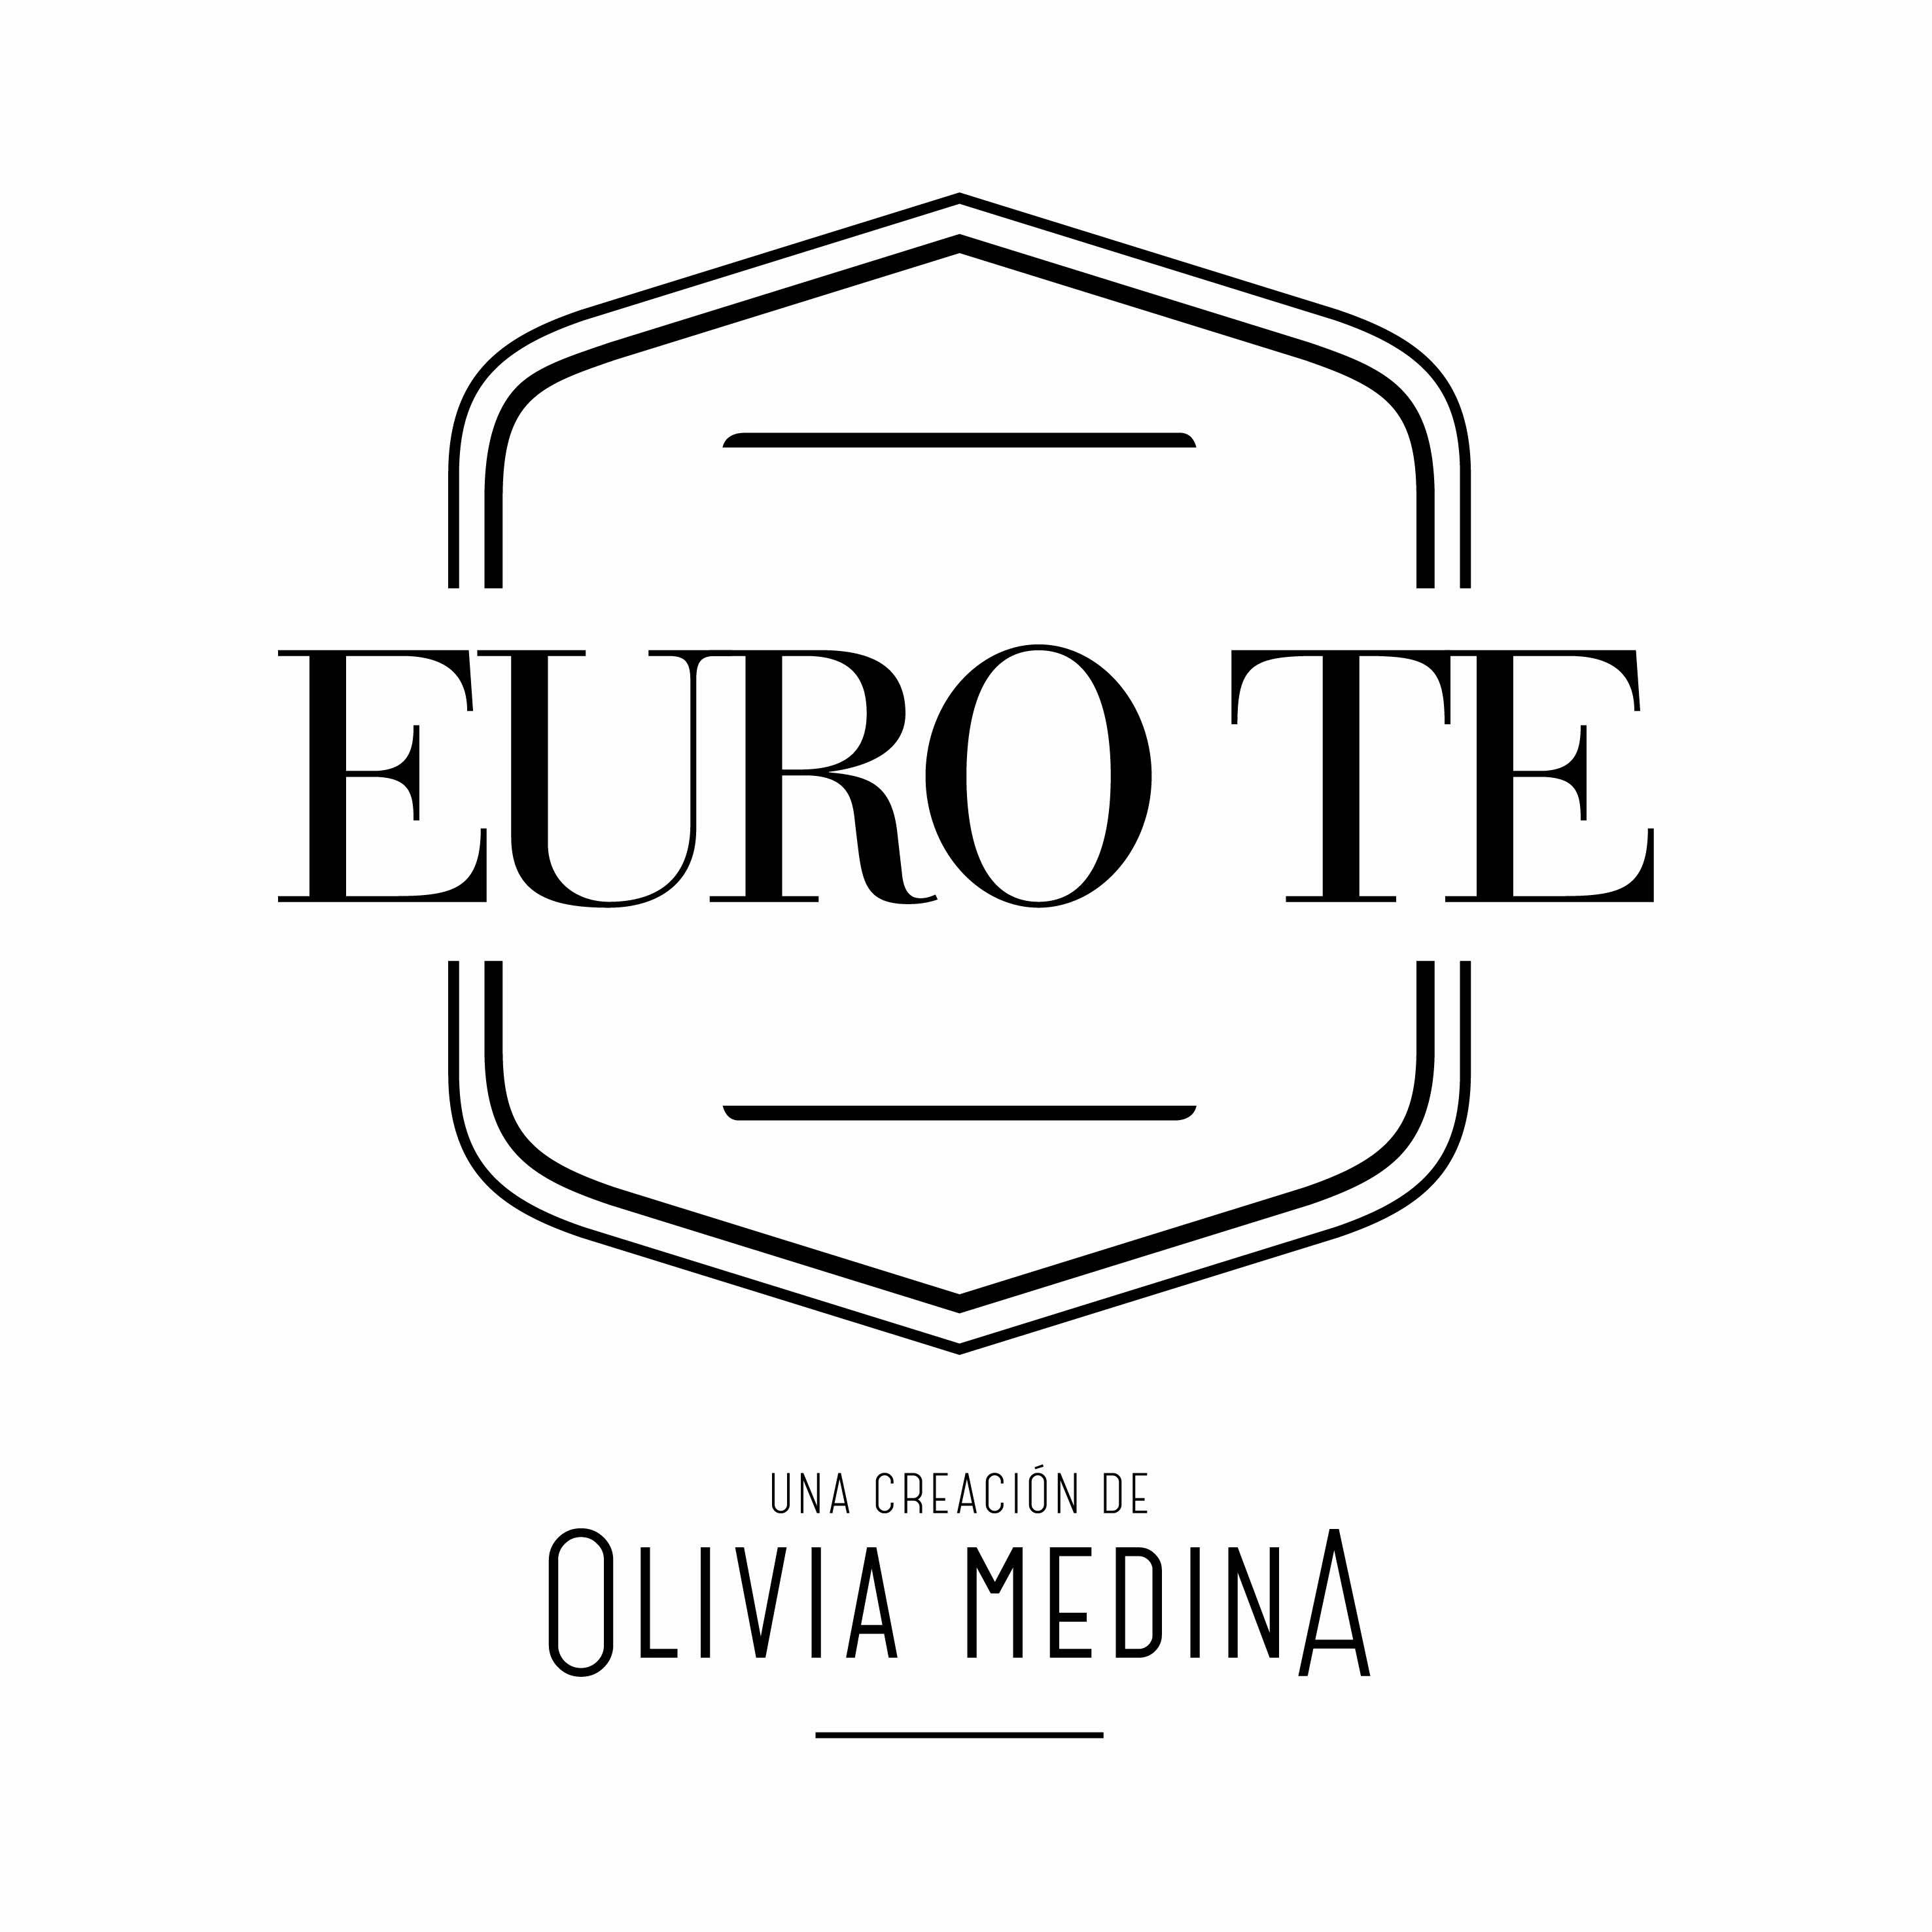 www.eurote.com.mx/index/tienda